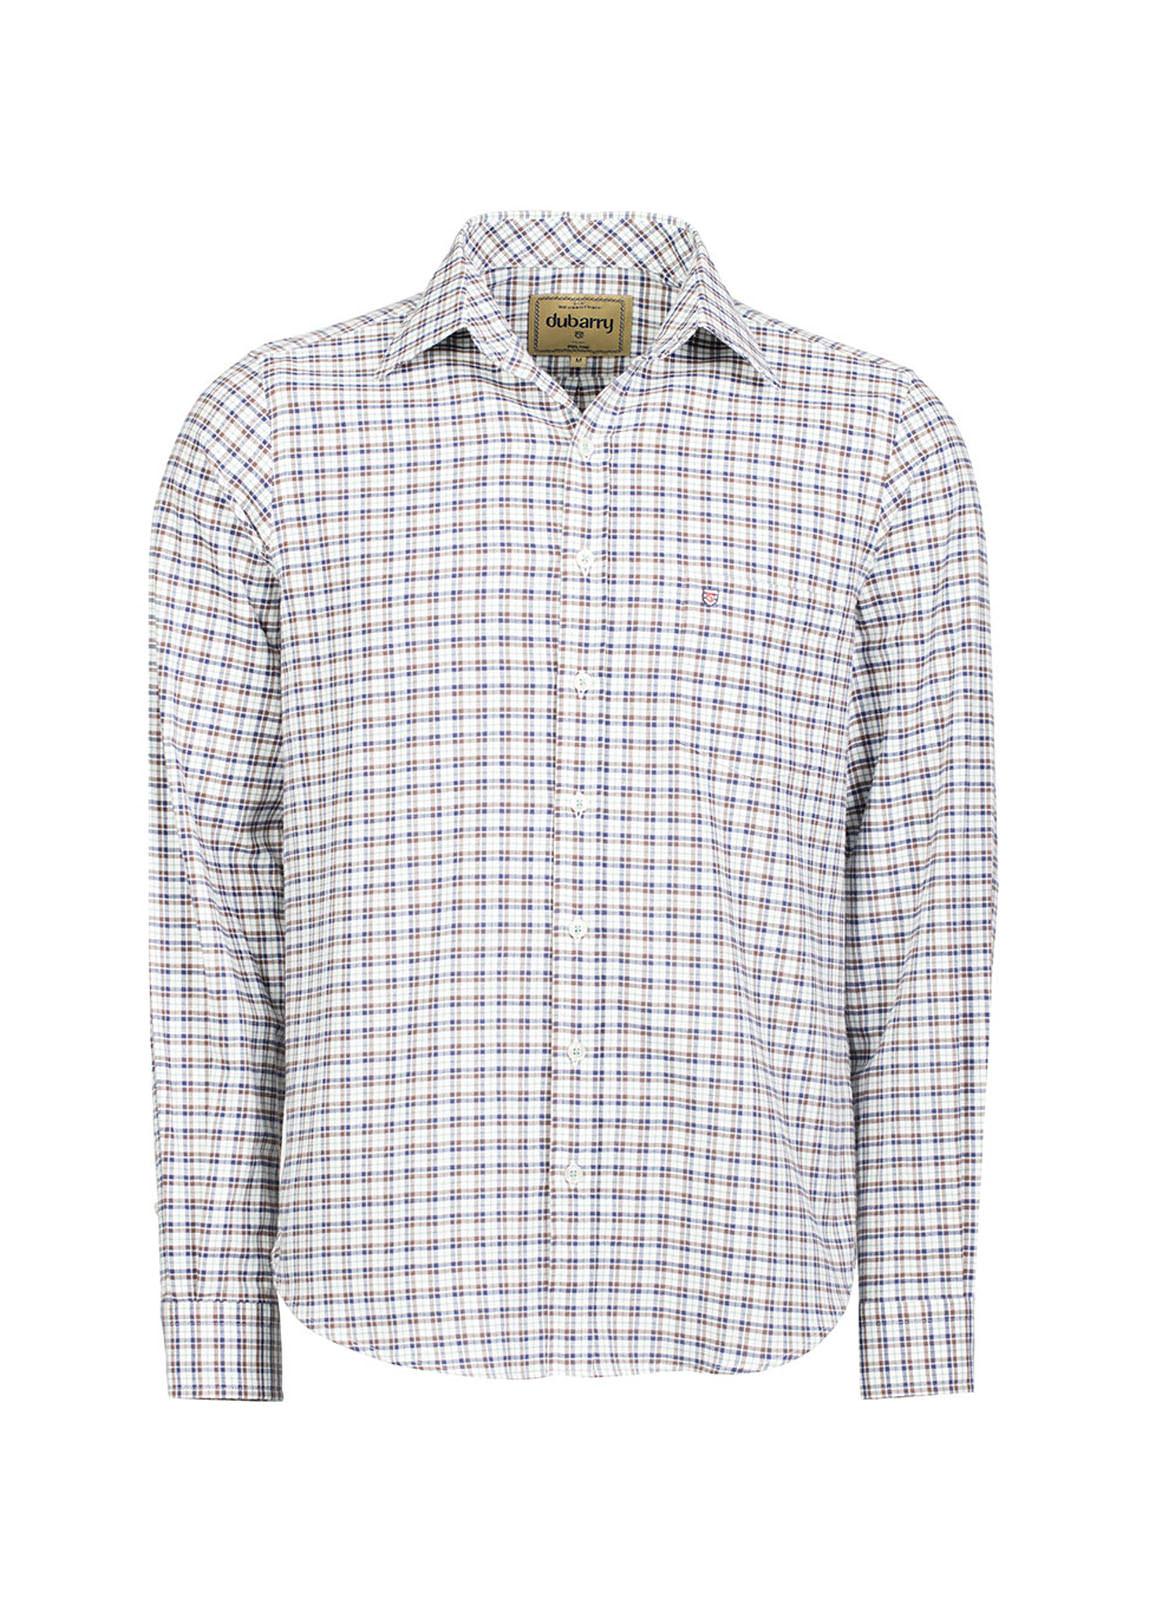 Dubarry_ Slane Men's Cotton Button Up Shirt - Navy/Bordo_Image_2